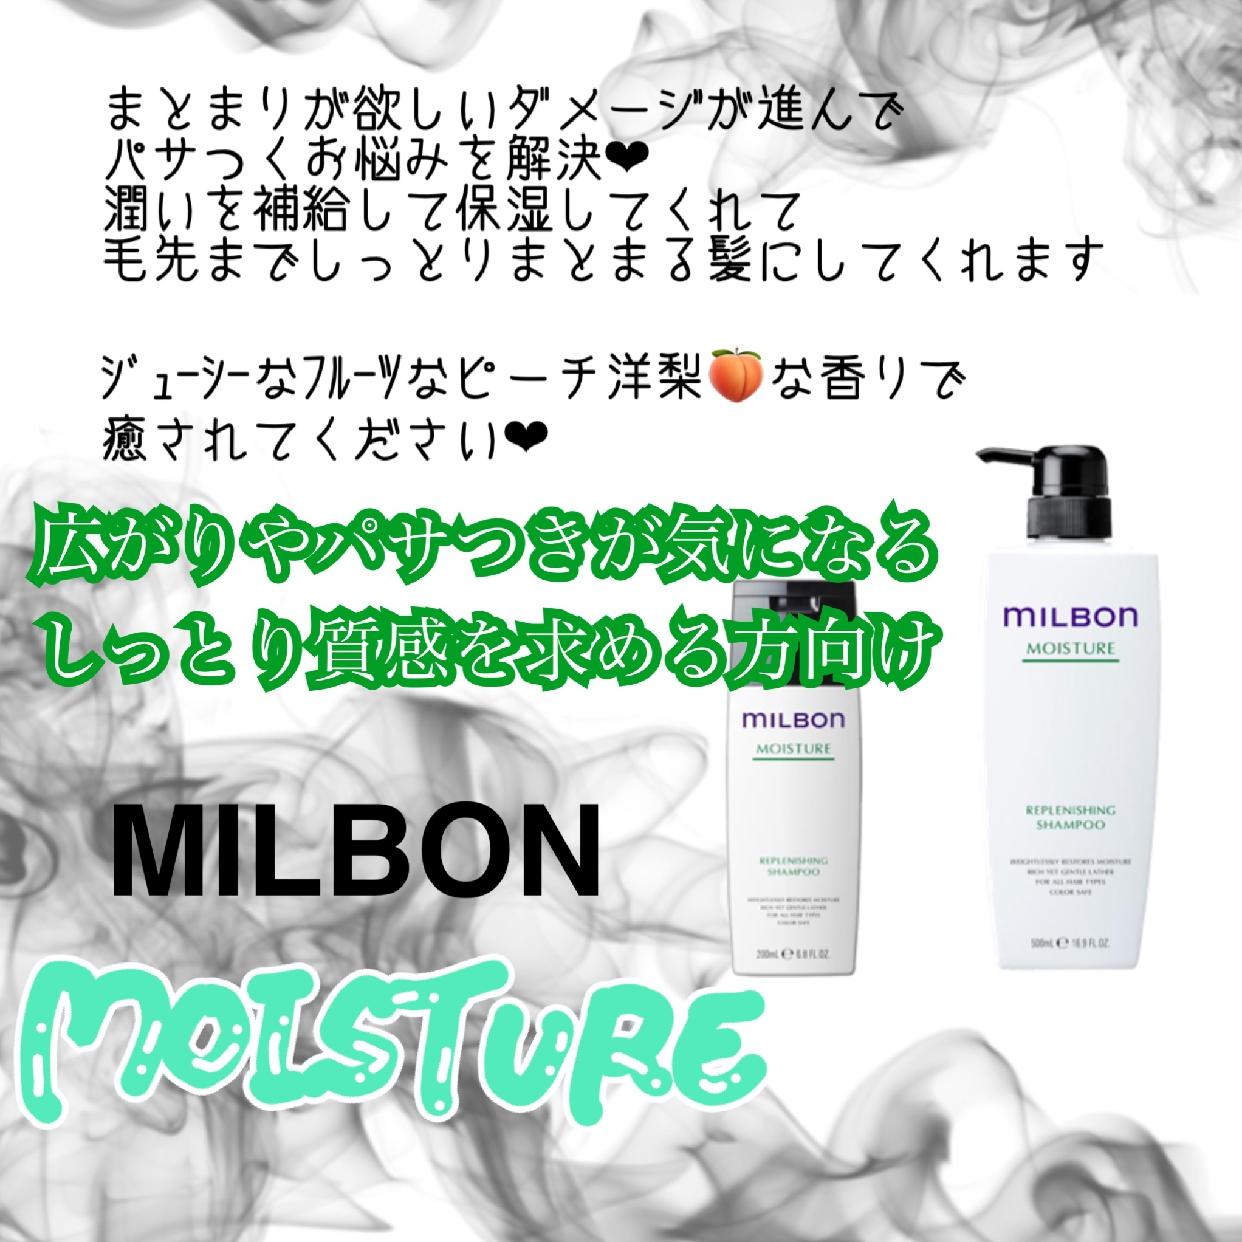 milbon(ミルボン) リプレニッシング シャンプーを使ったsrnchamさんのクチコミ画像